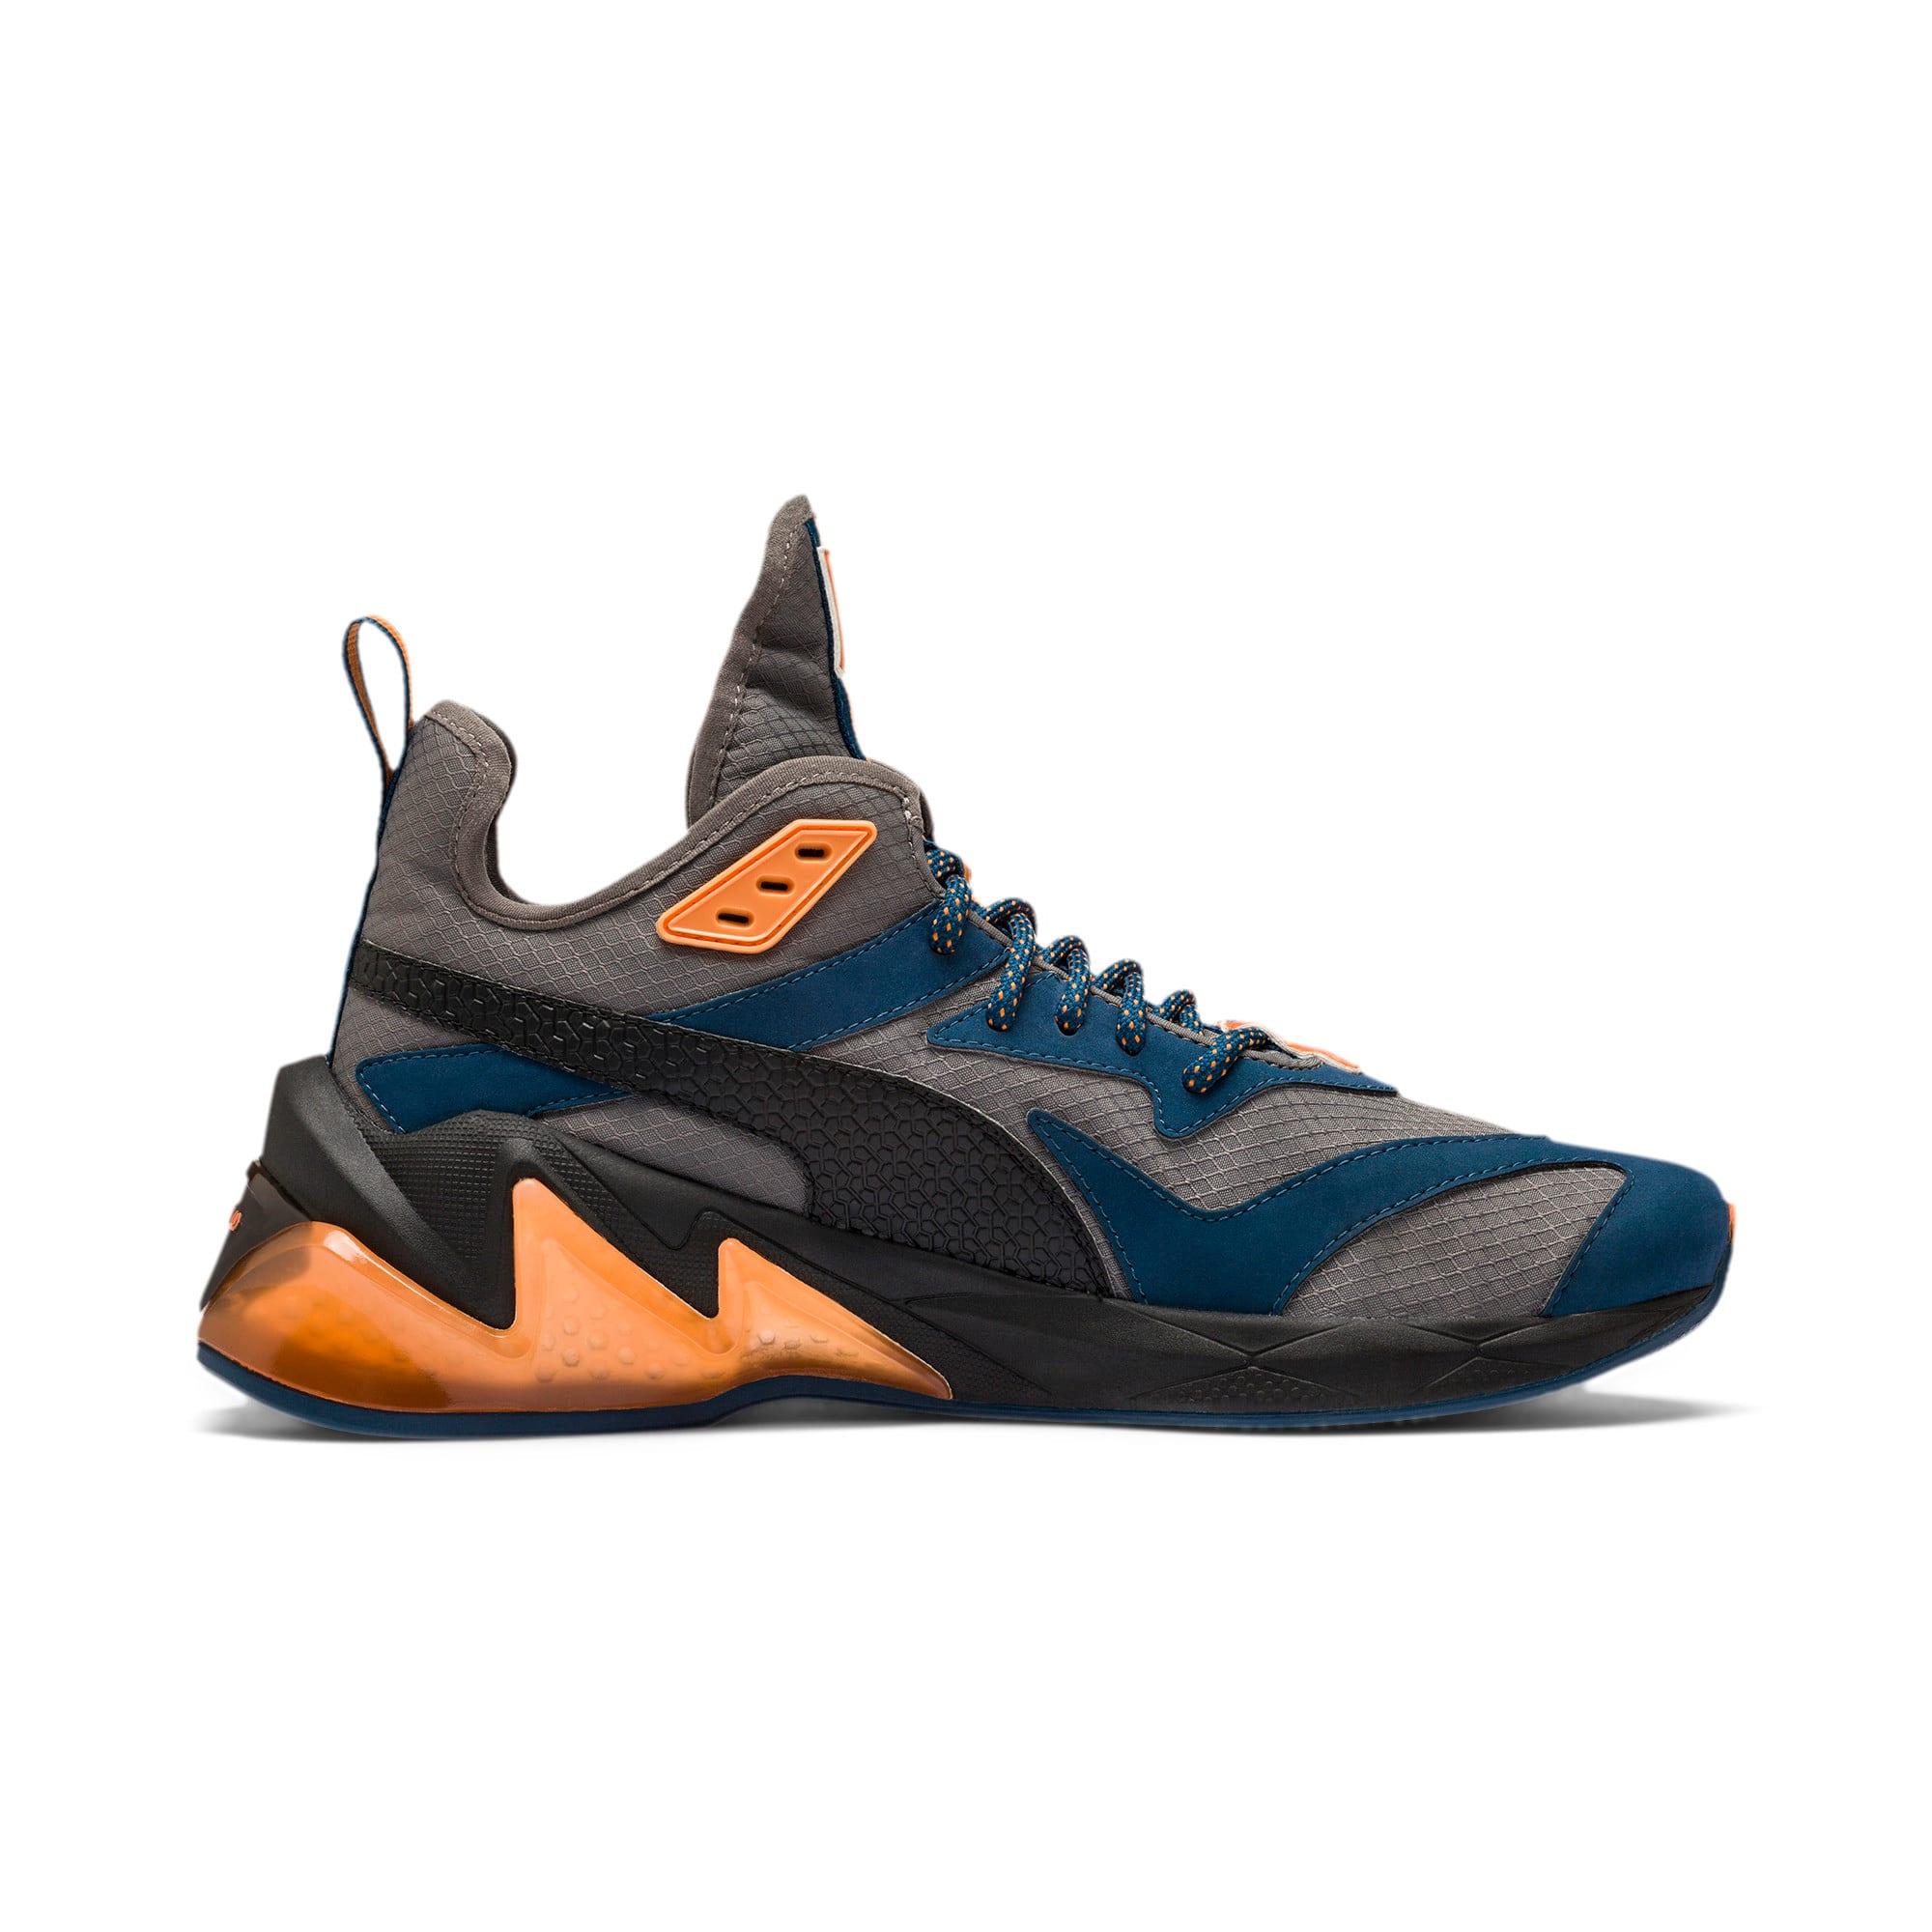 Thumbnail 6 of LQDCELL Origin Terrain Men's Shoes, CASTLEROCK-Puma Black, medium